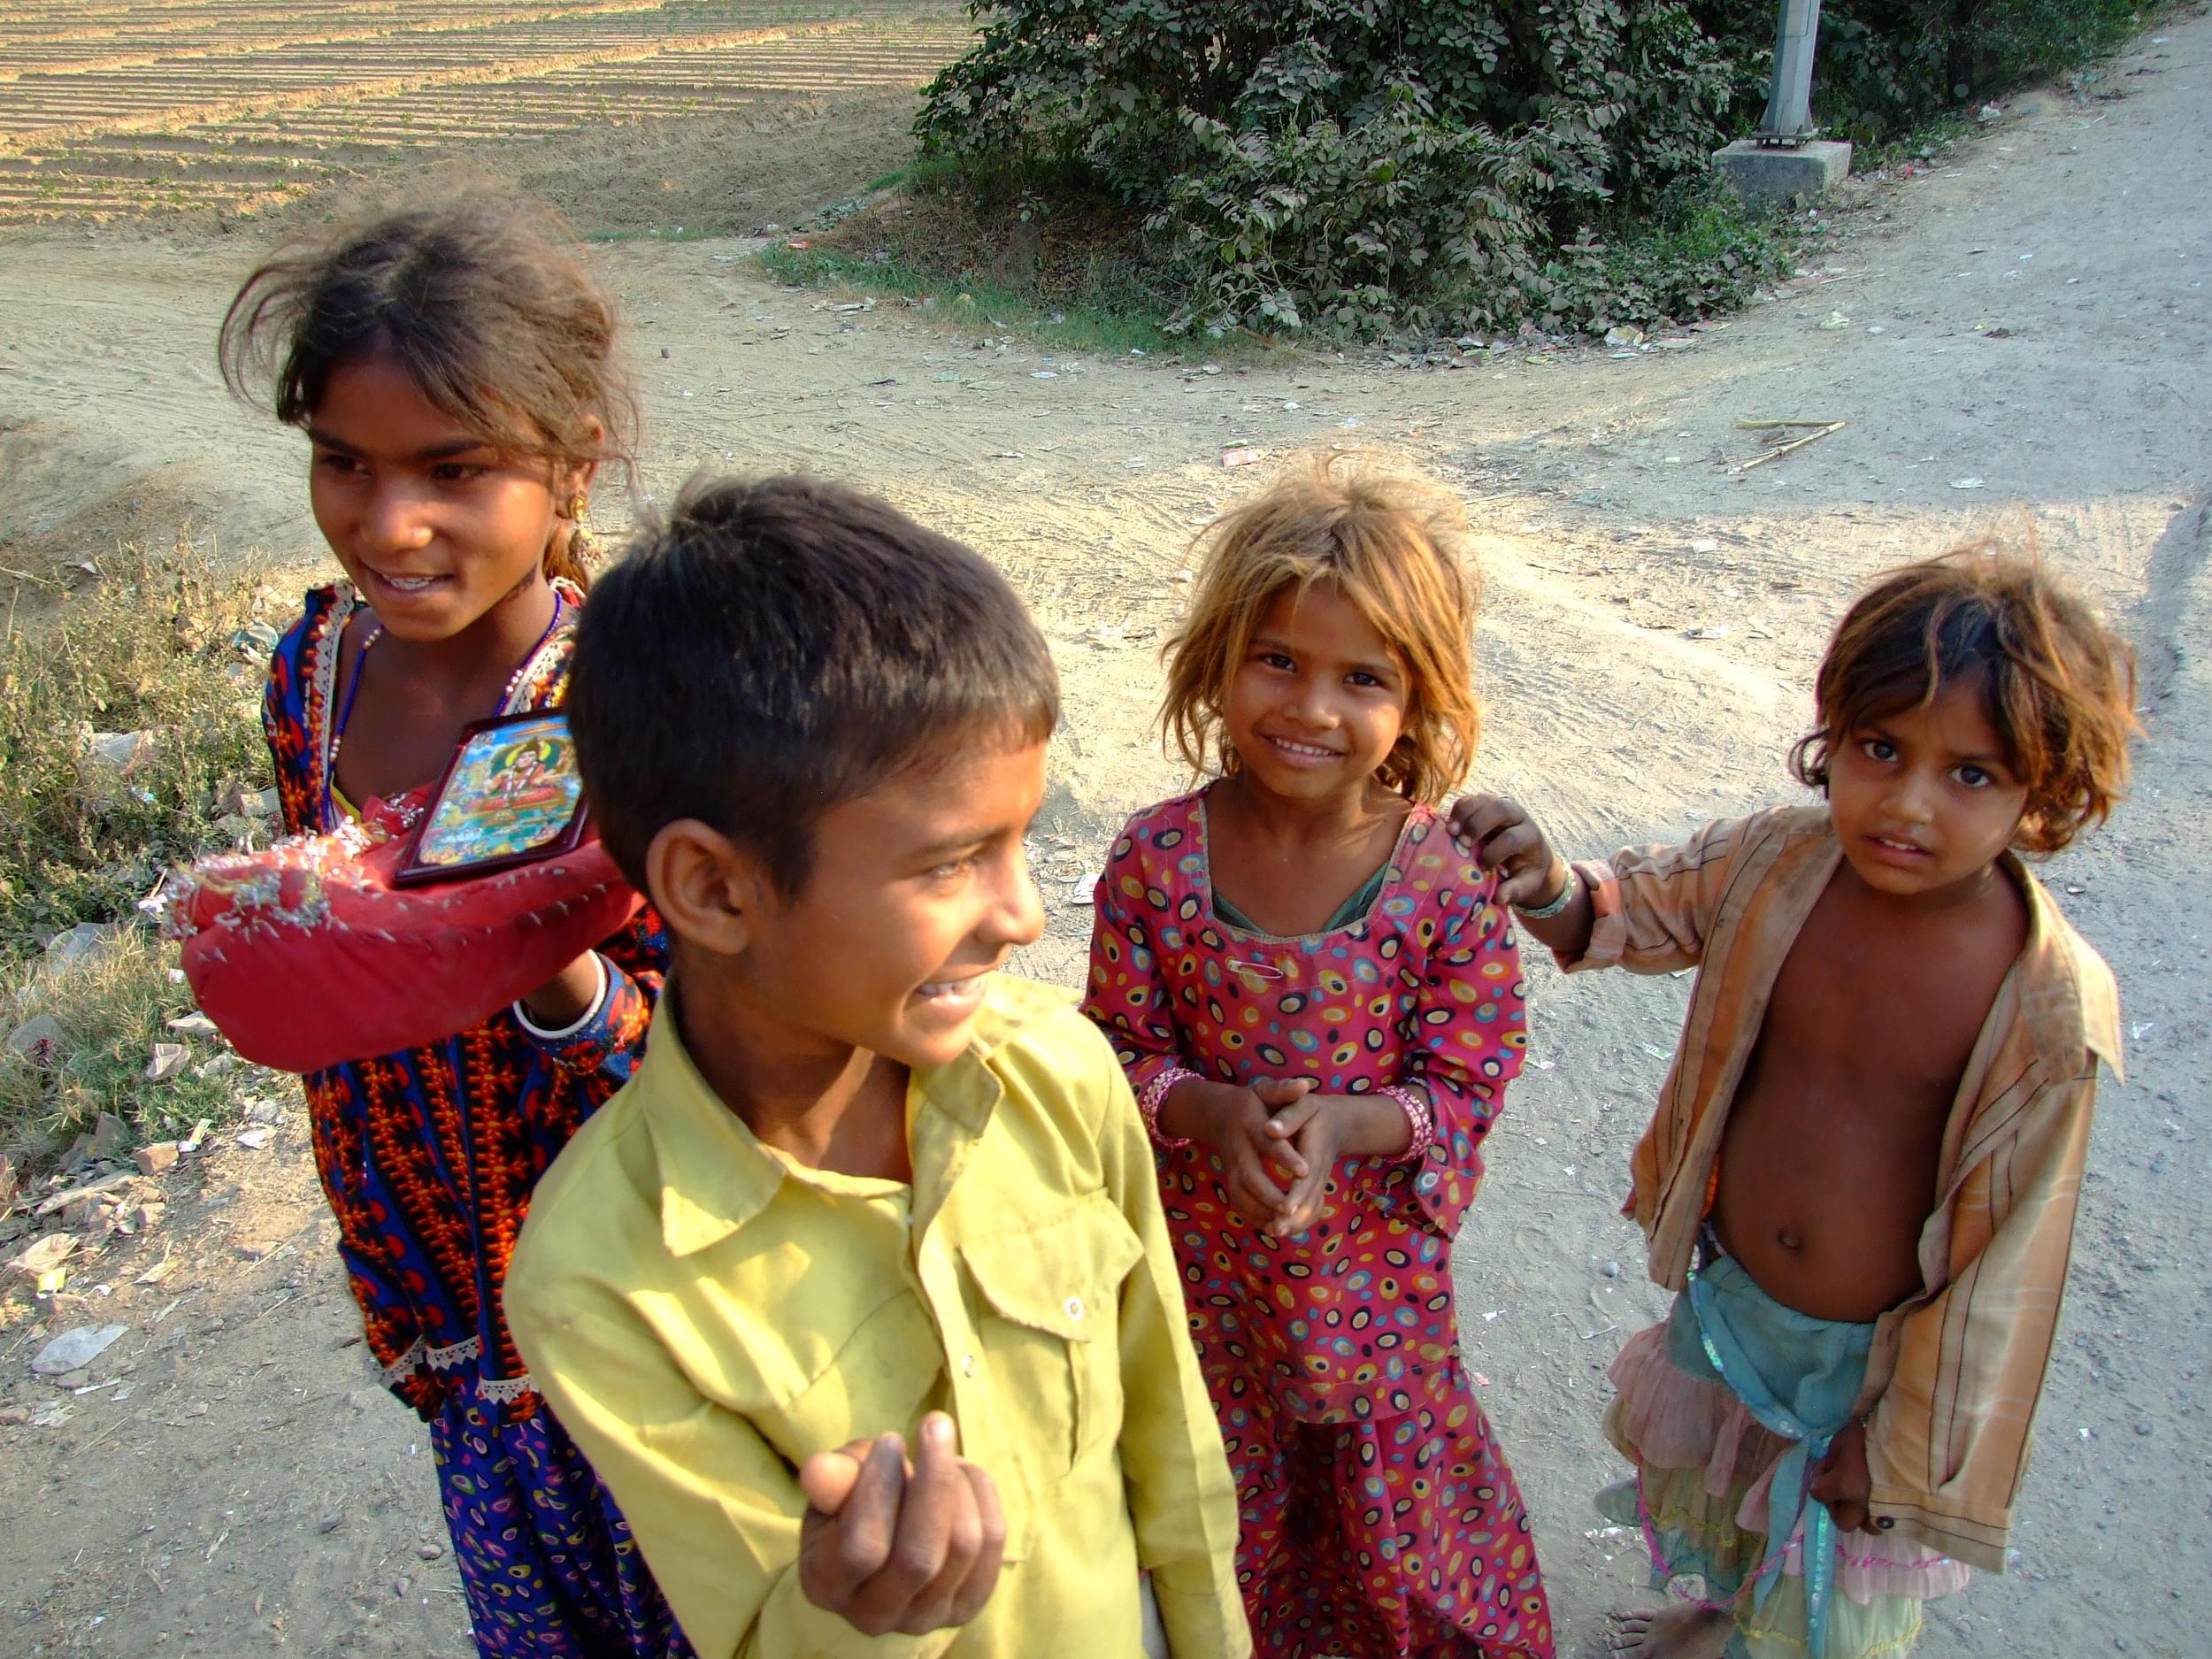 Near Agra, India